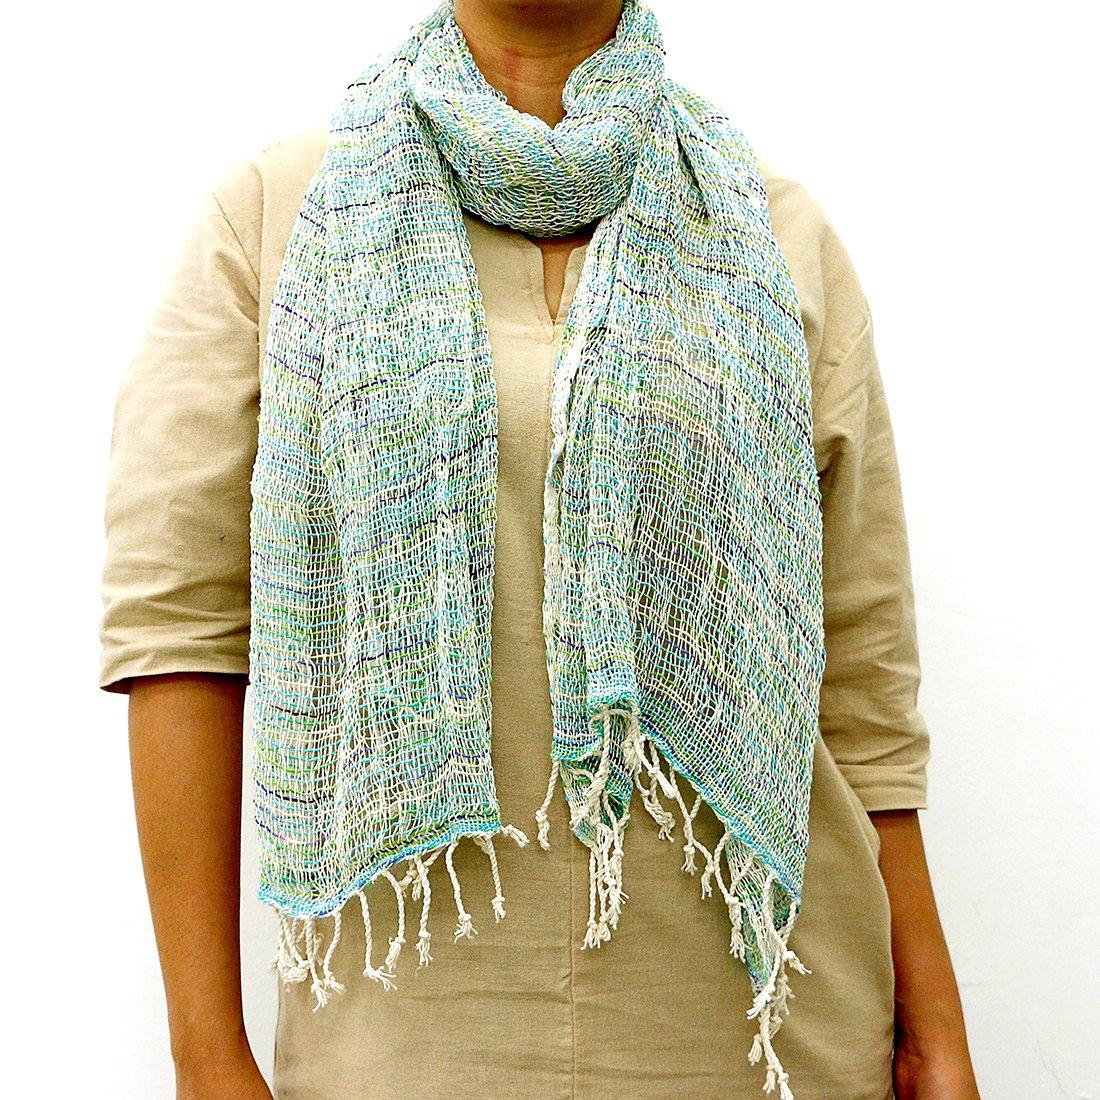 Taruron Woven Net Cotton Plain or Multi Colors Summer fashionable Scarf (Beige Blue)